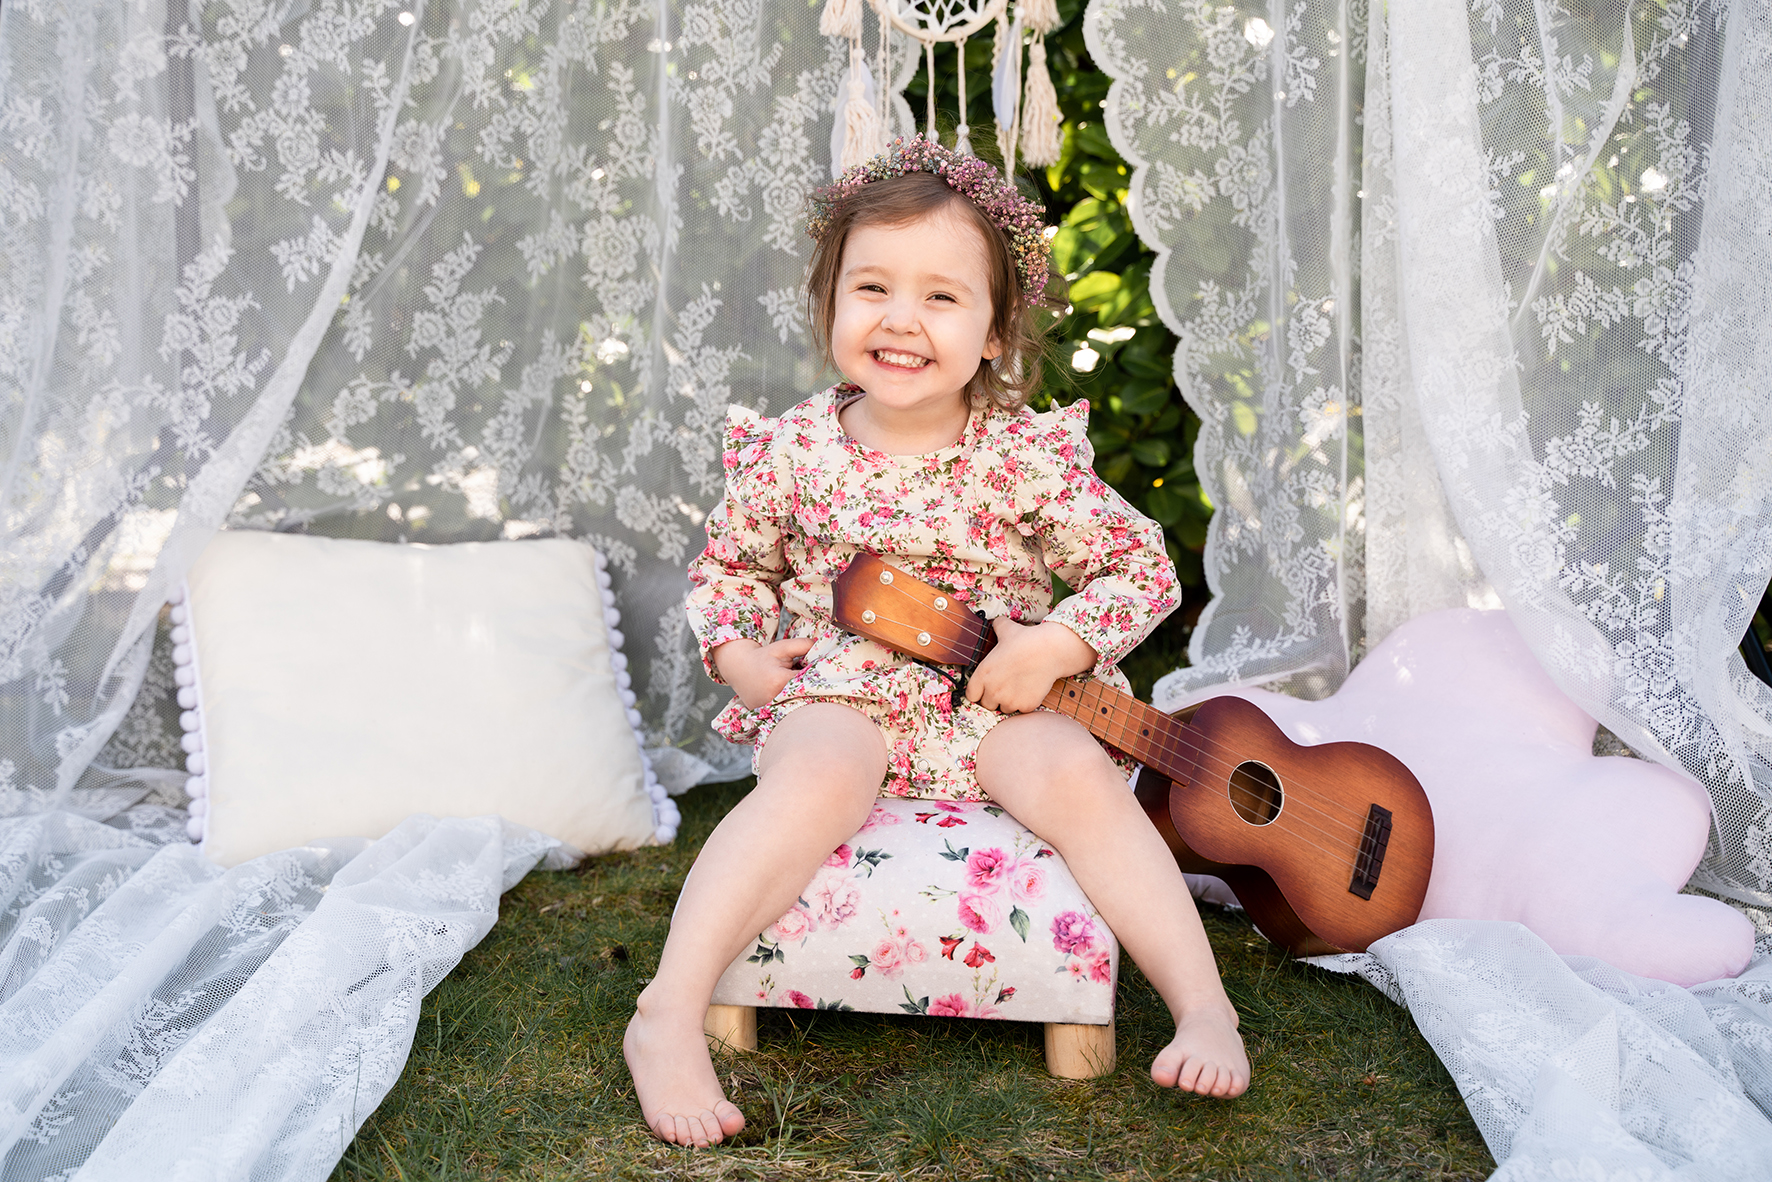 Kindershooting Geschwisterfotos Fotostudio Lilienthal Familienfotograf Bremen